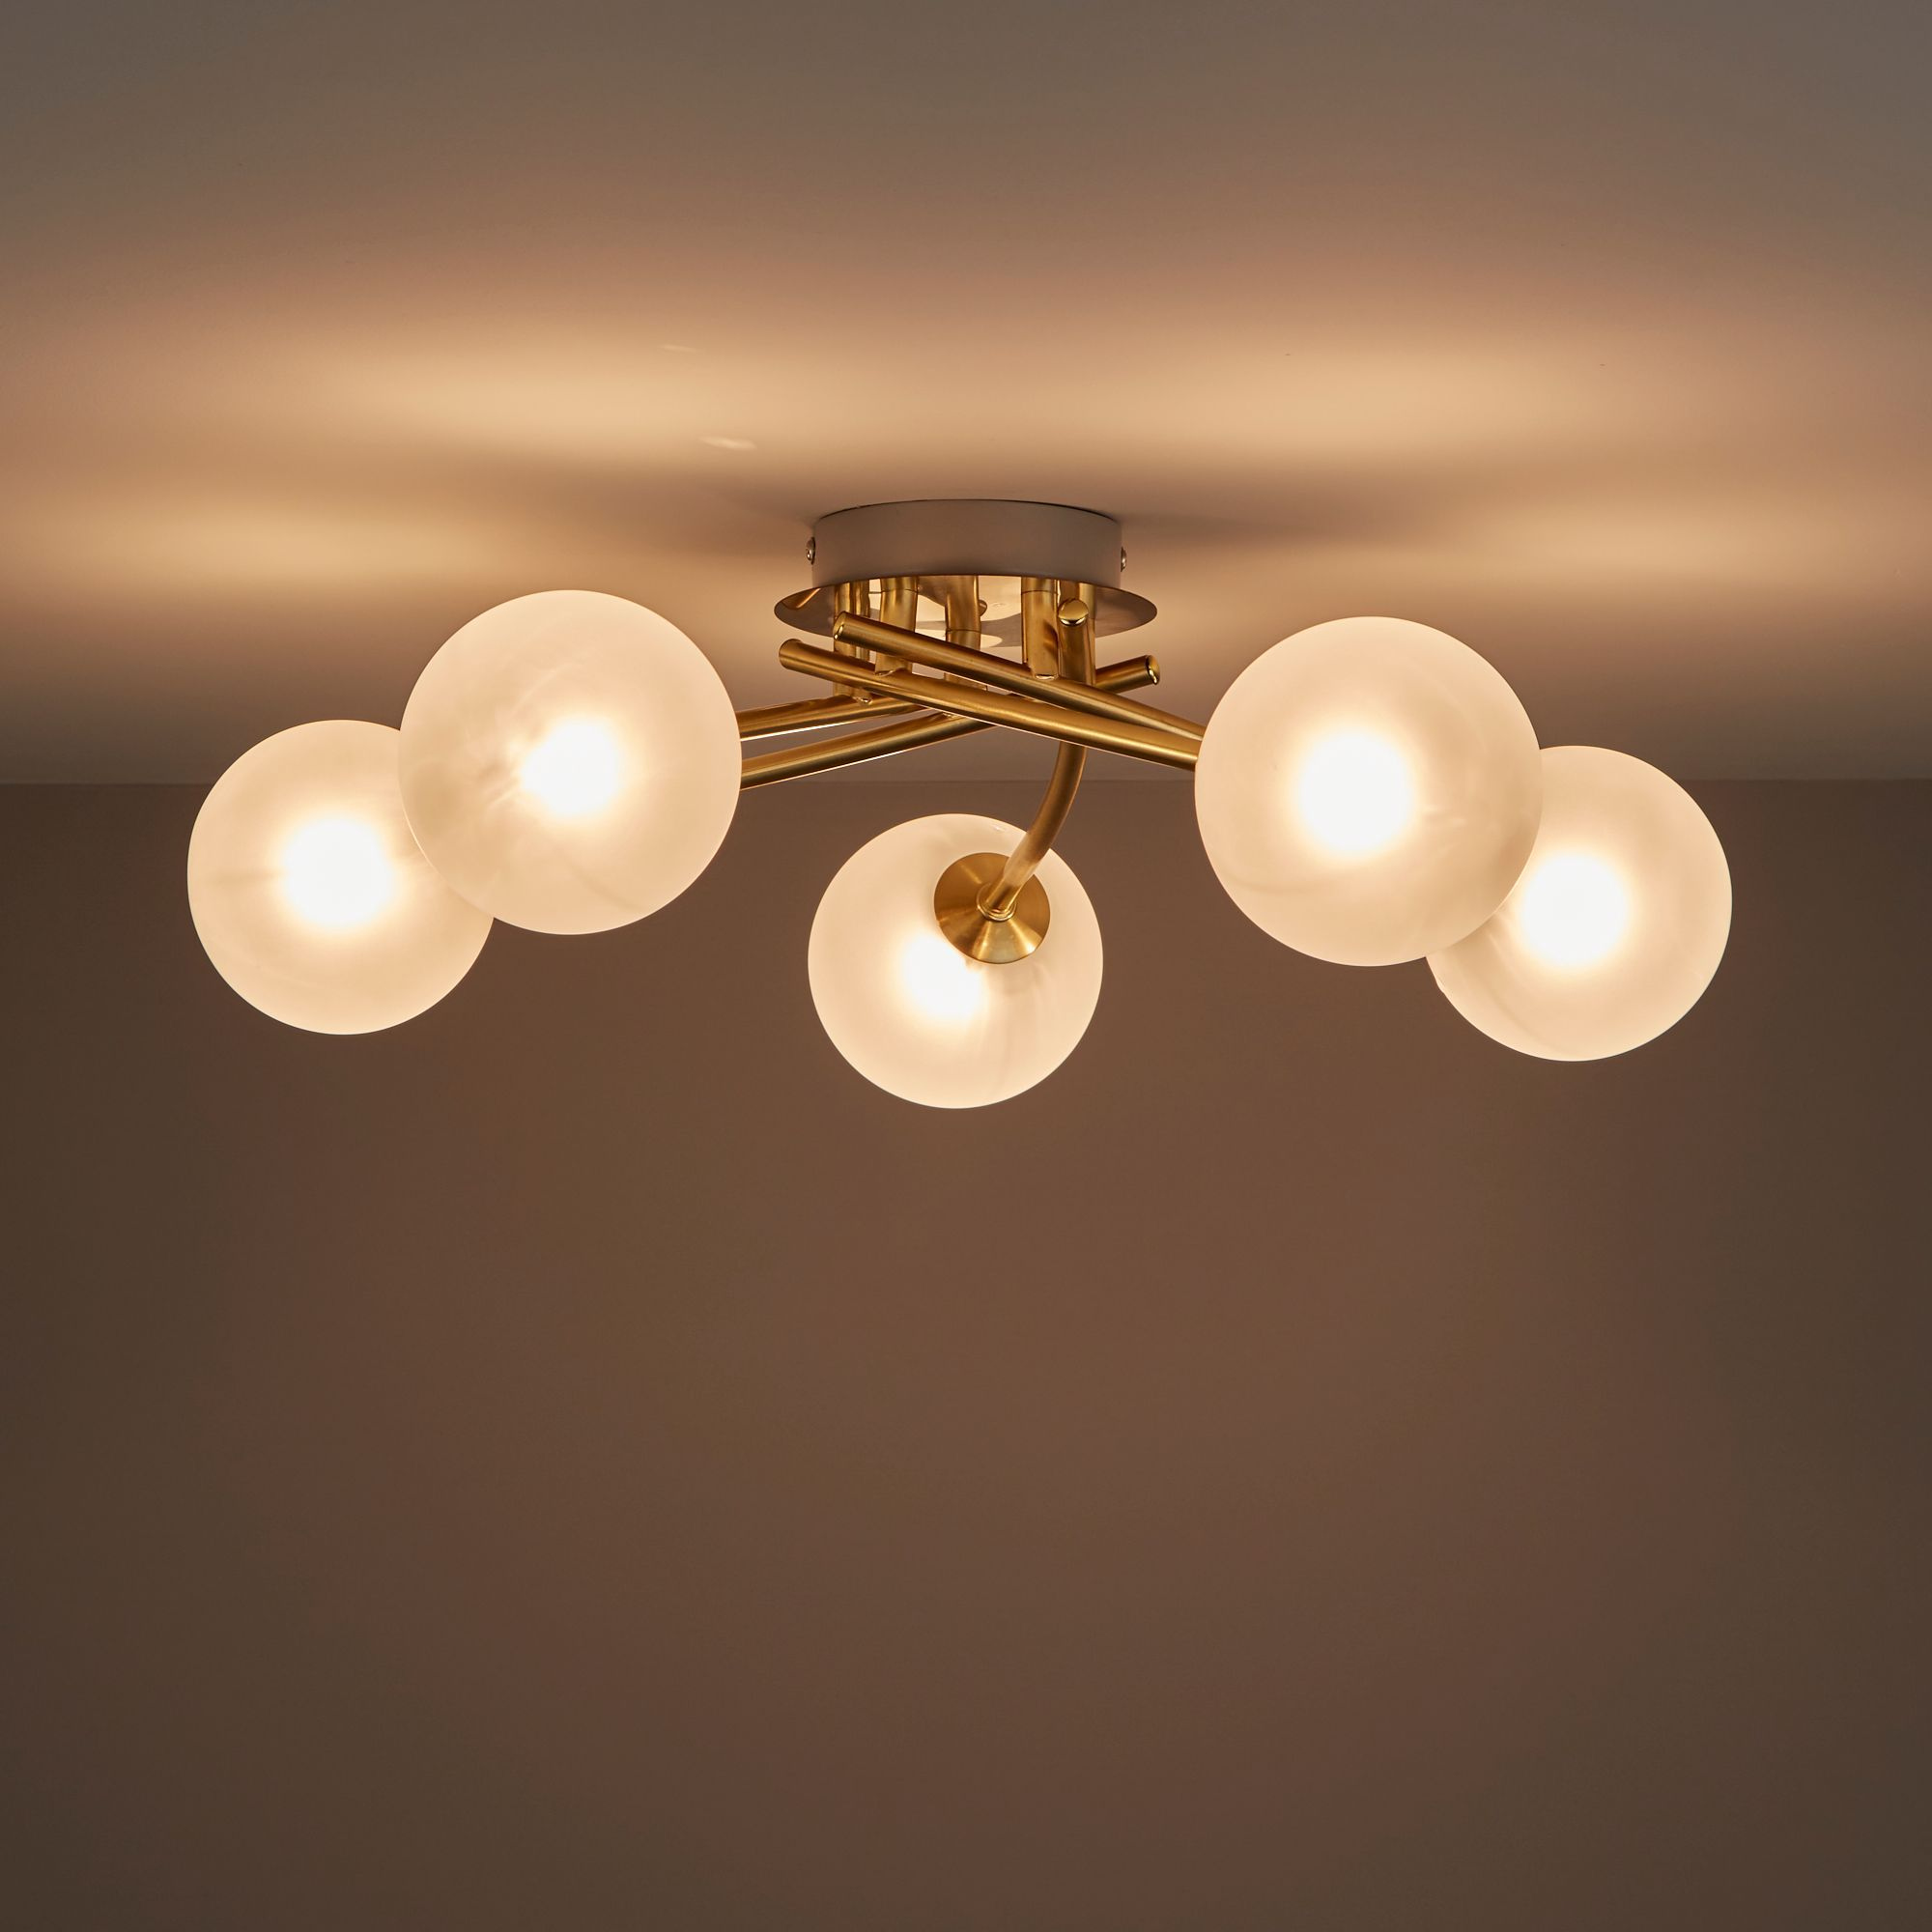 Pila Brushed Gold Effect 5 Lamp Ceiling Light